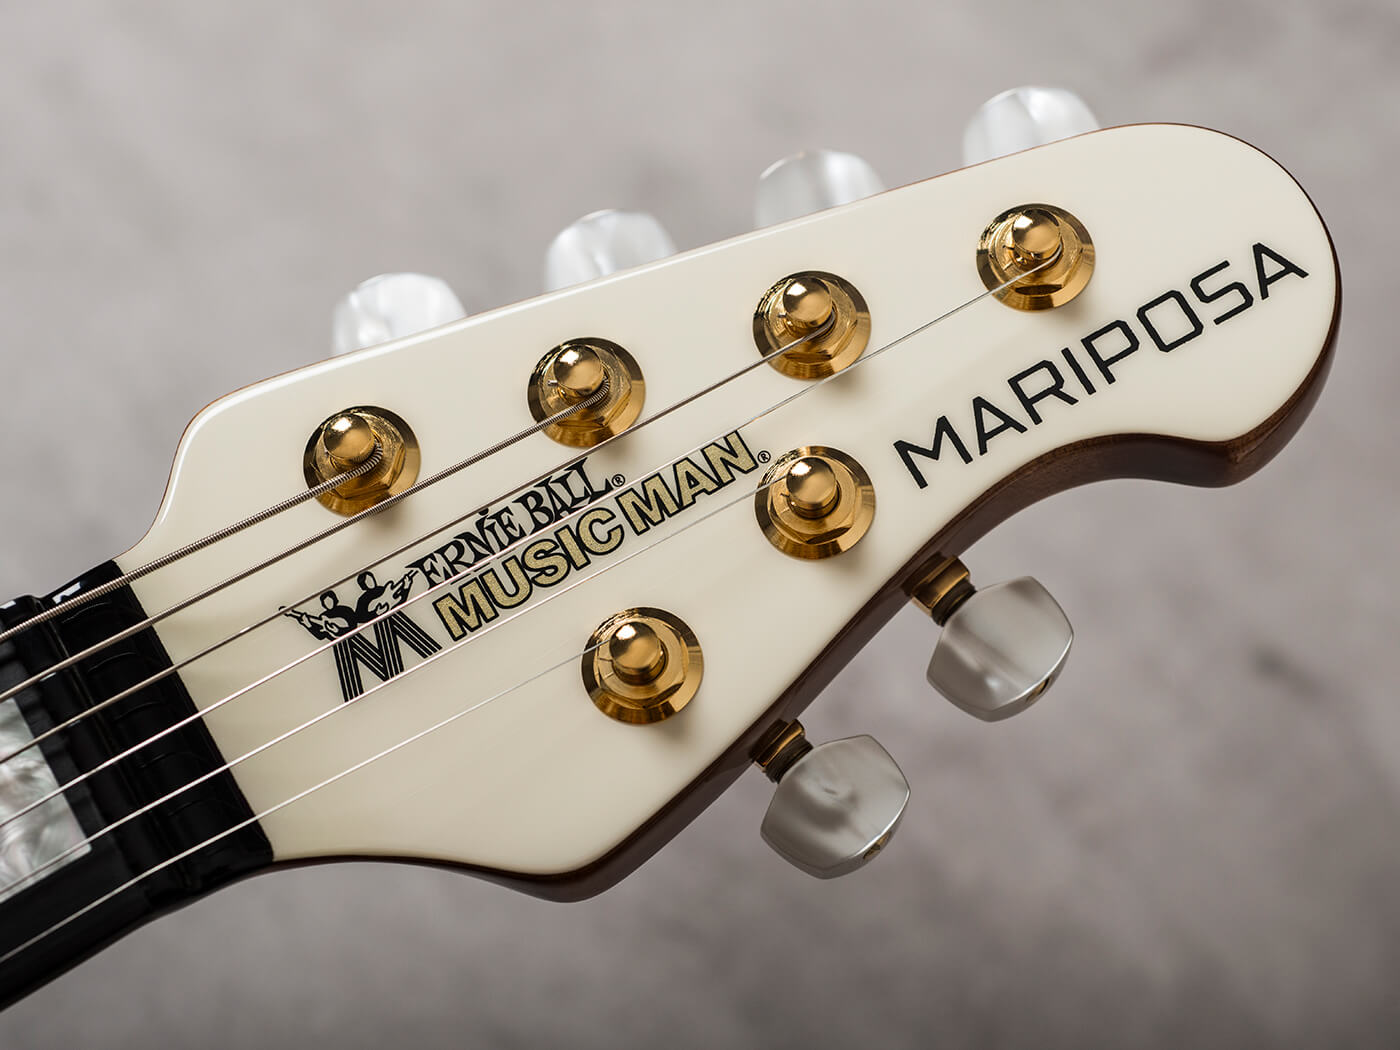 Music Man Mariposa (Headstock)